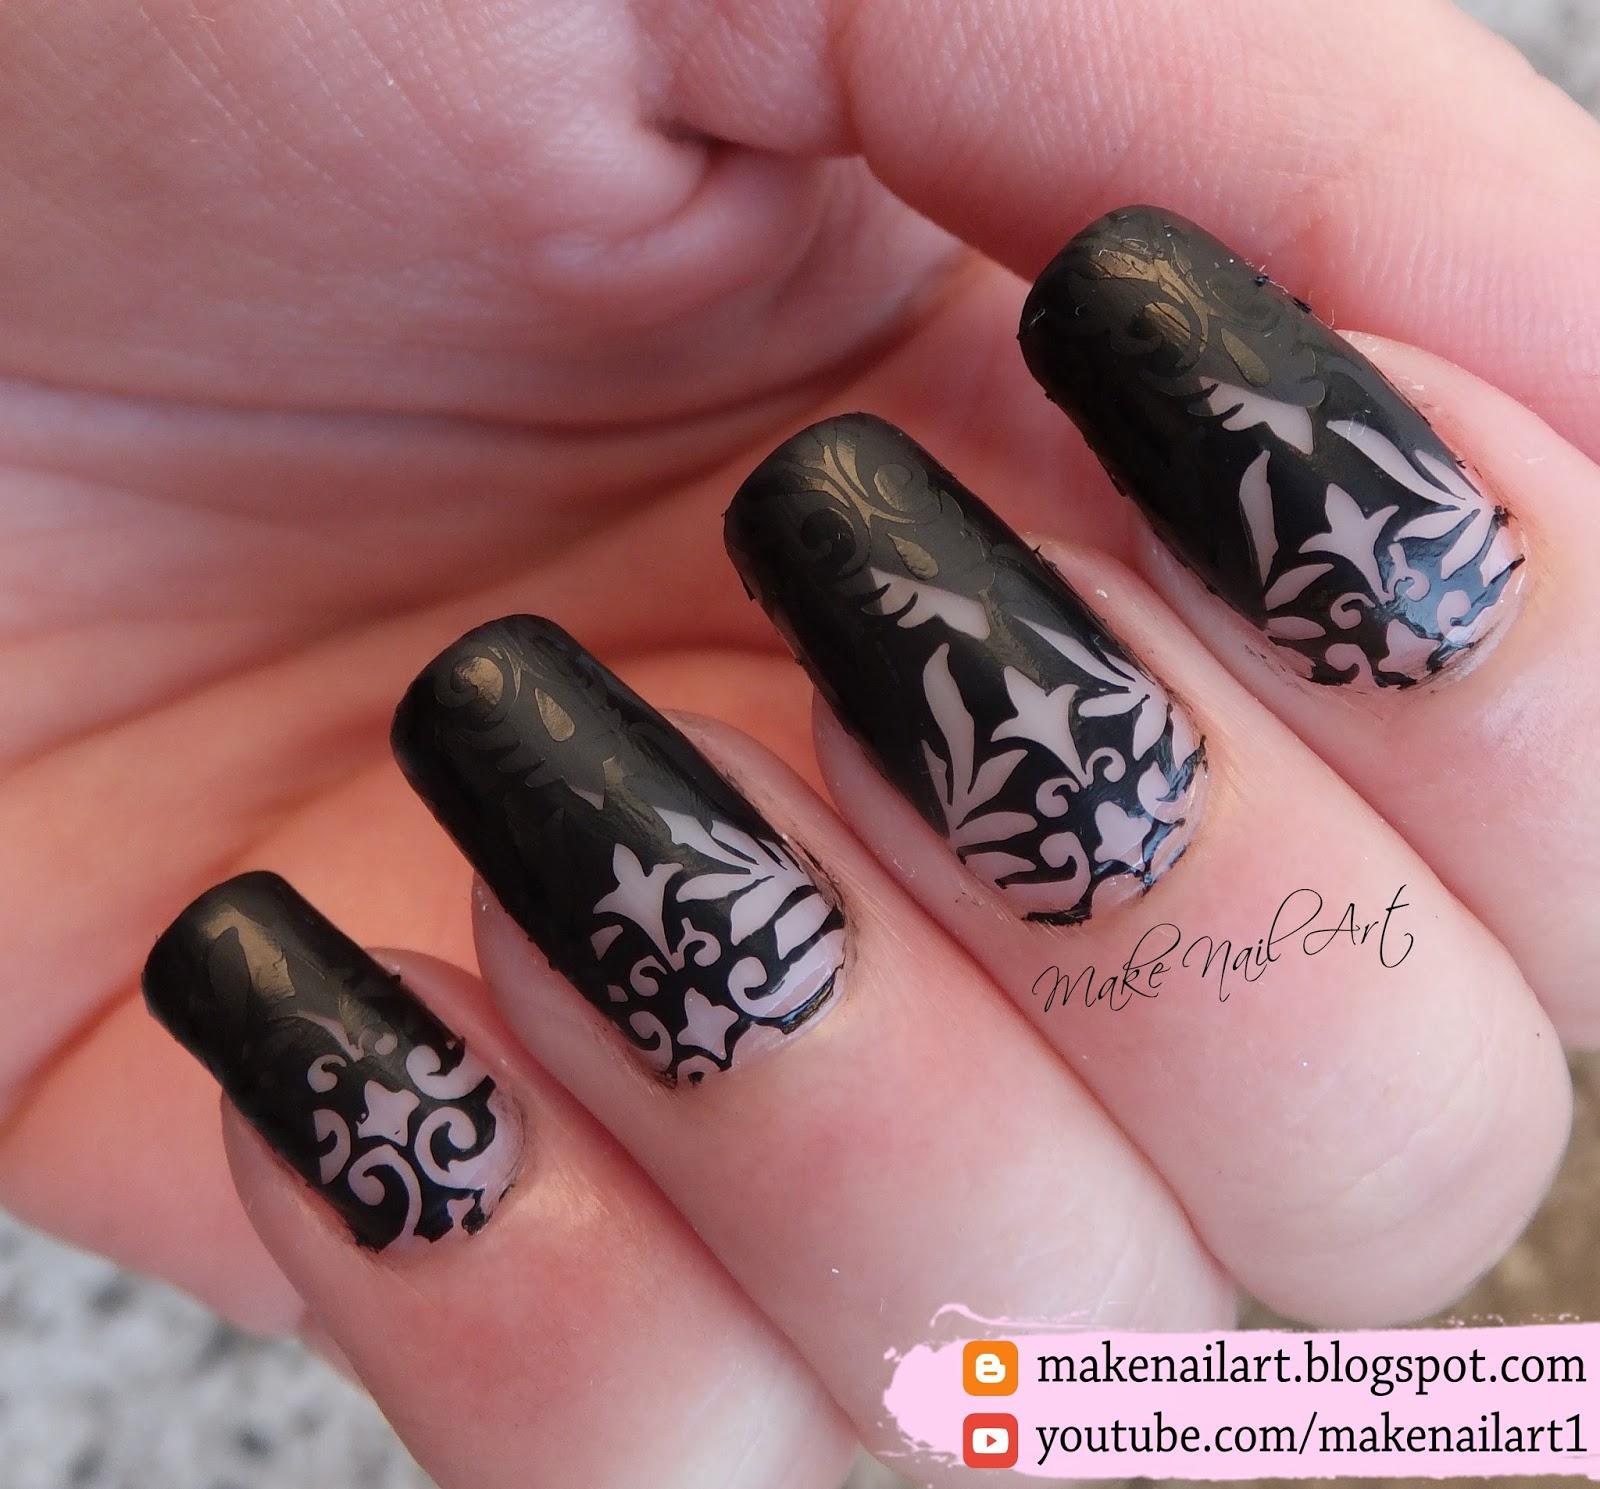 Make Nail Art: Little Black Dress Nail Art Design